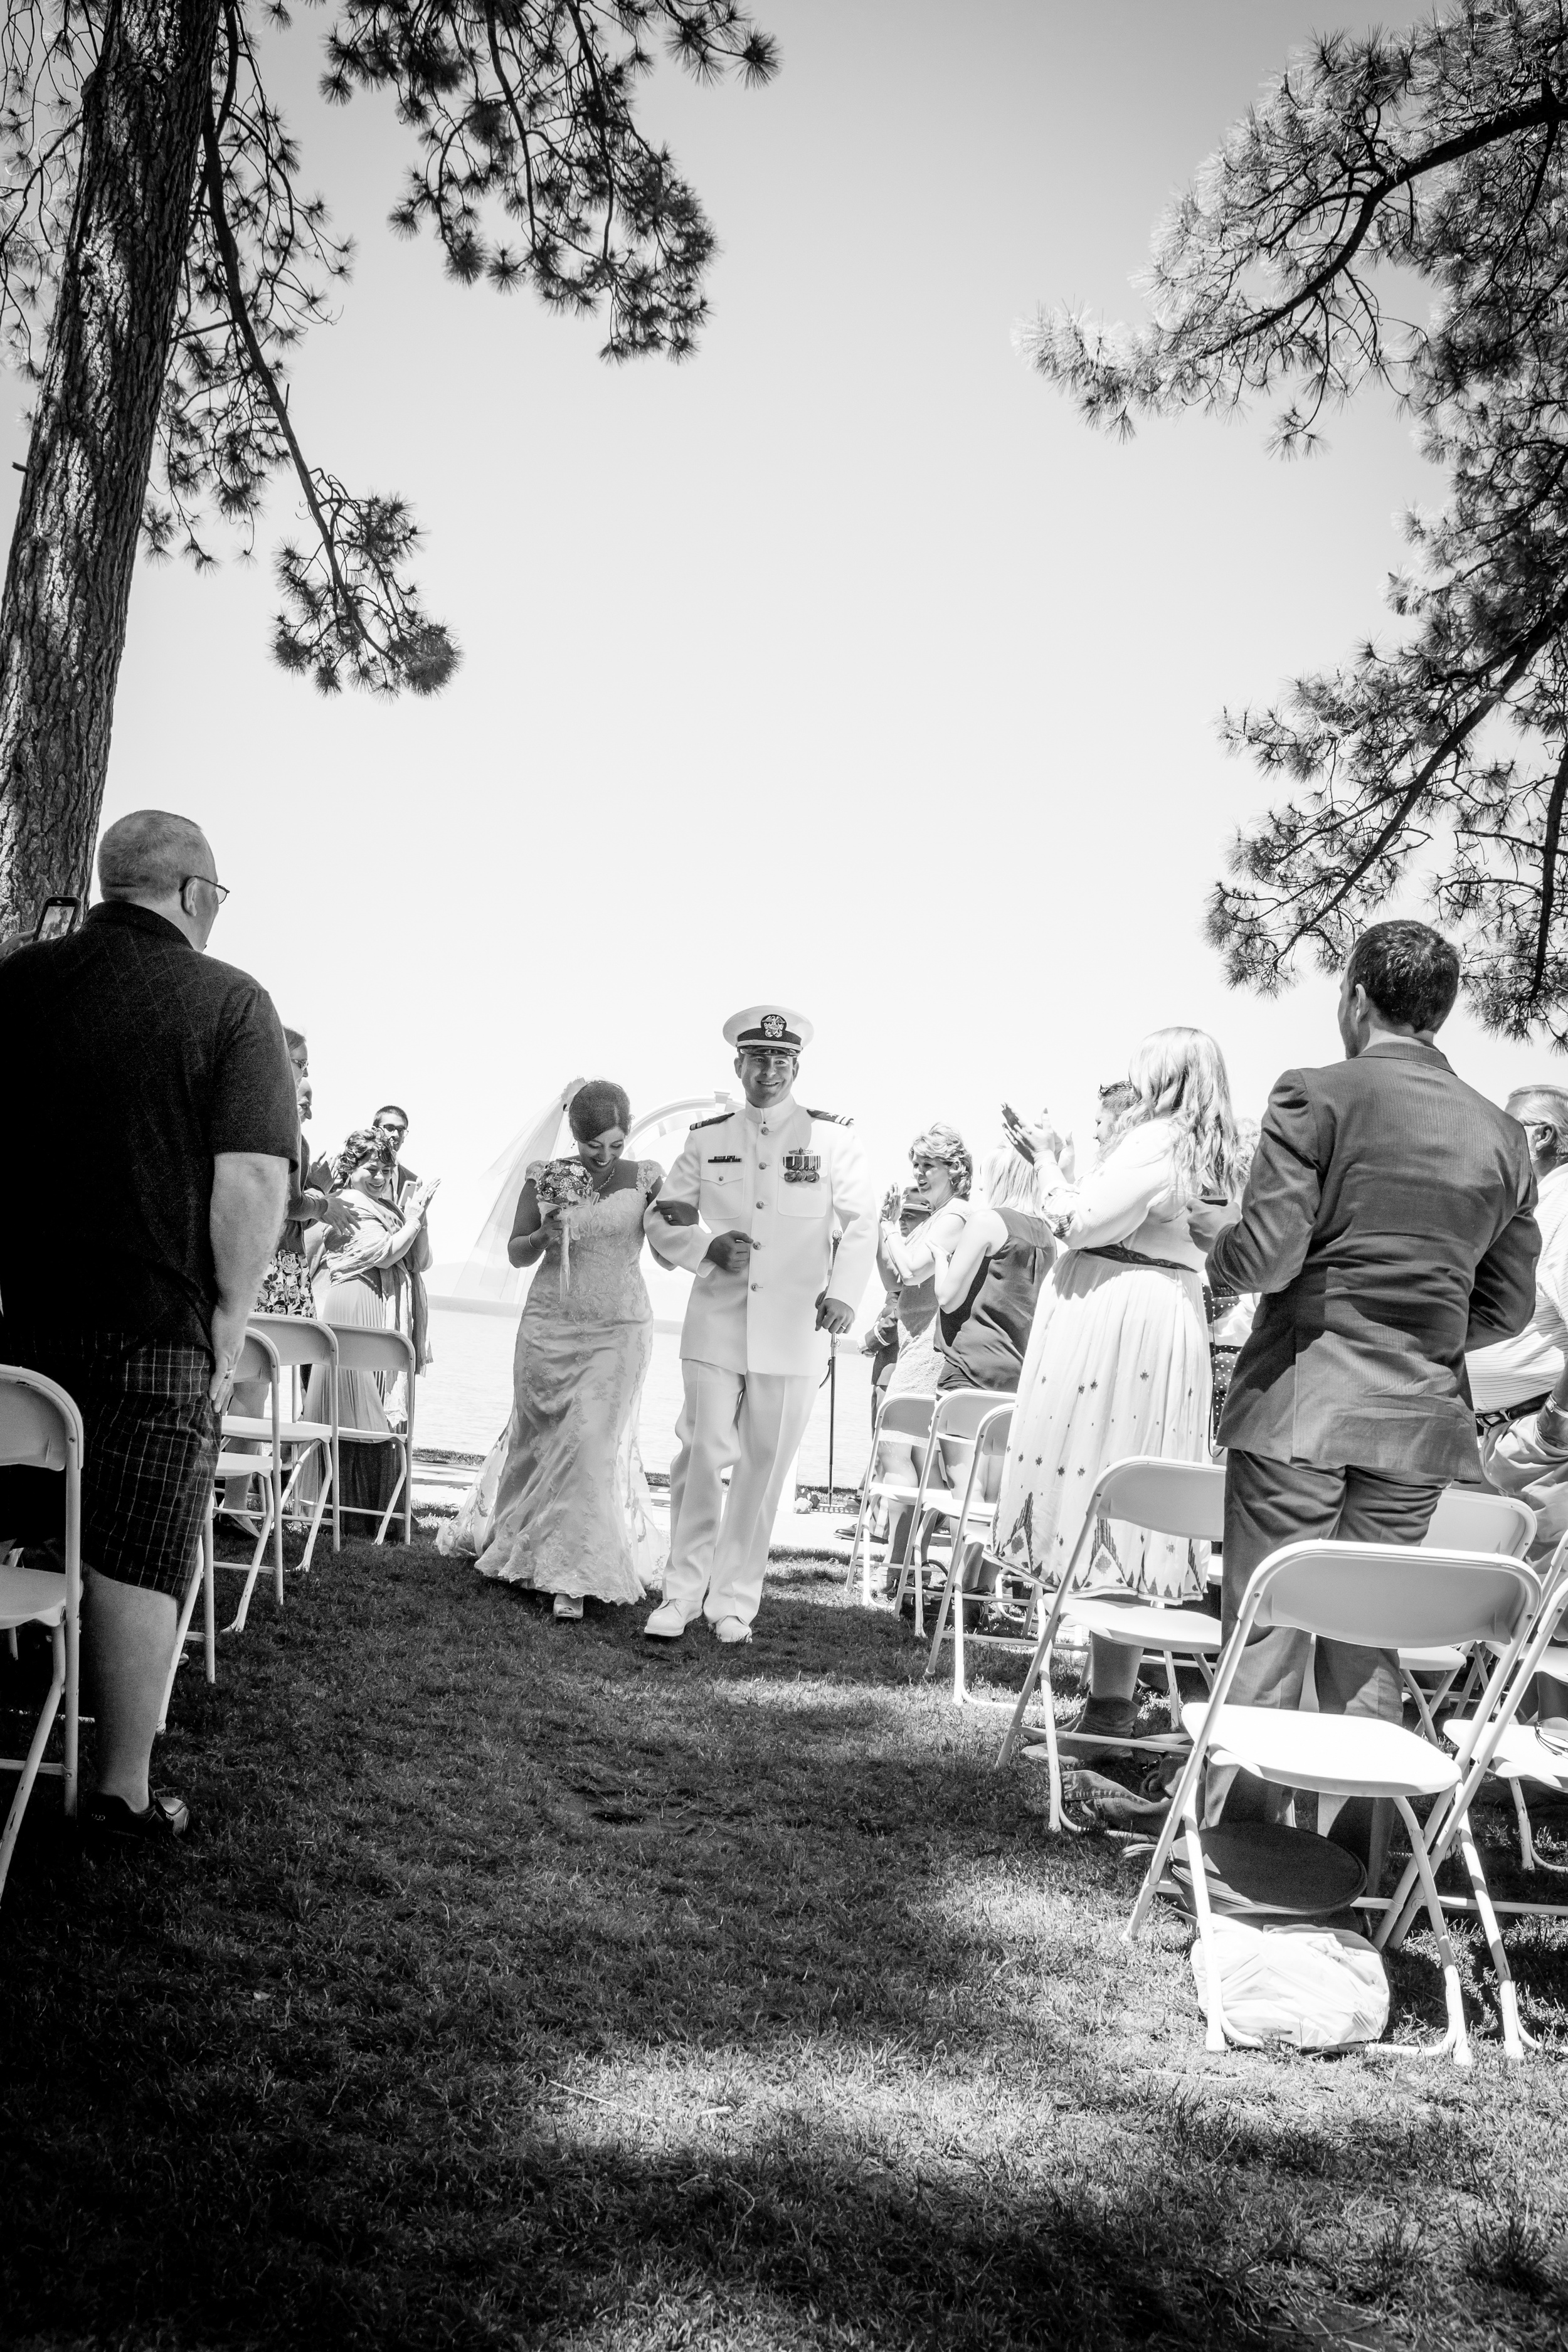 Poonam+John_Wedding_2014_056-2.jpg